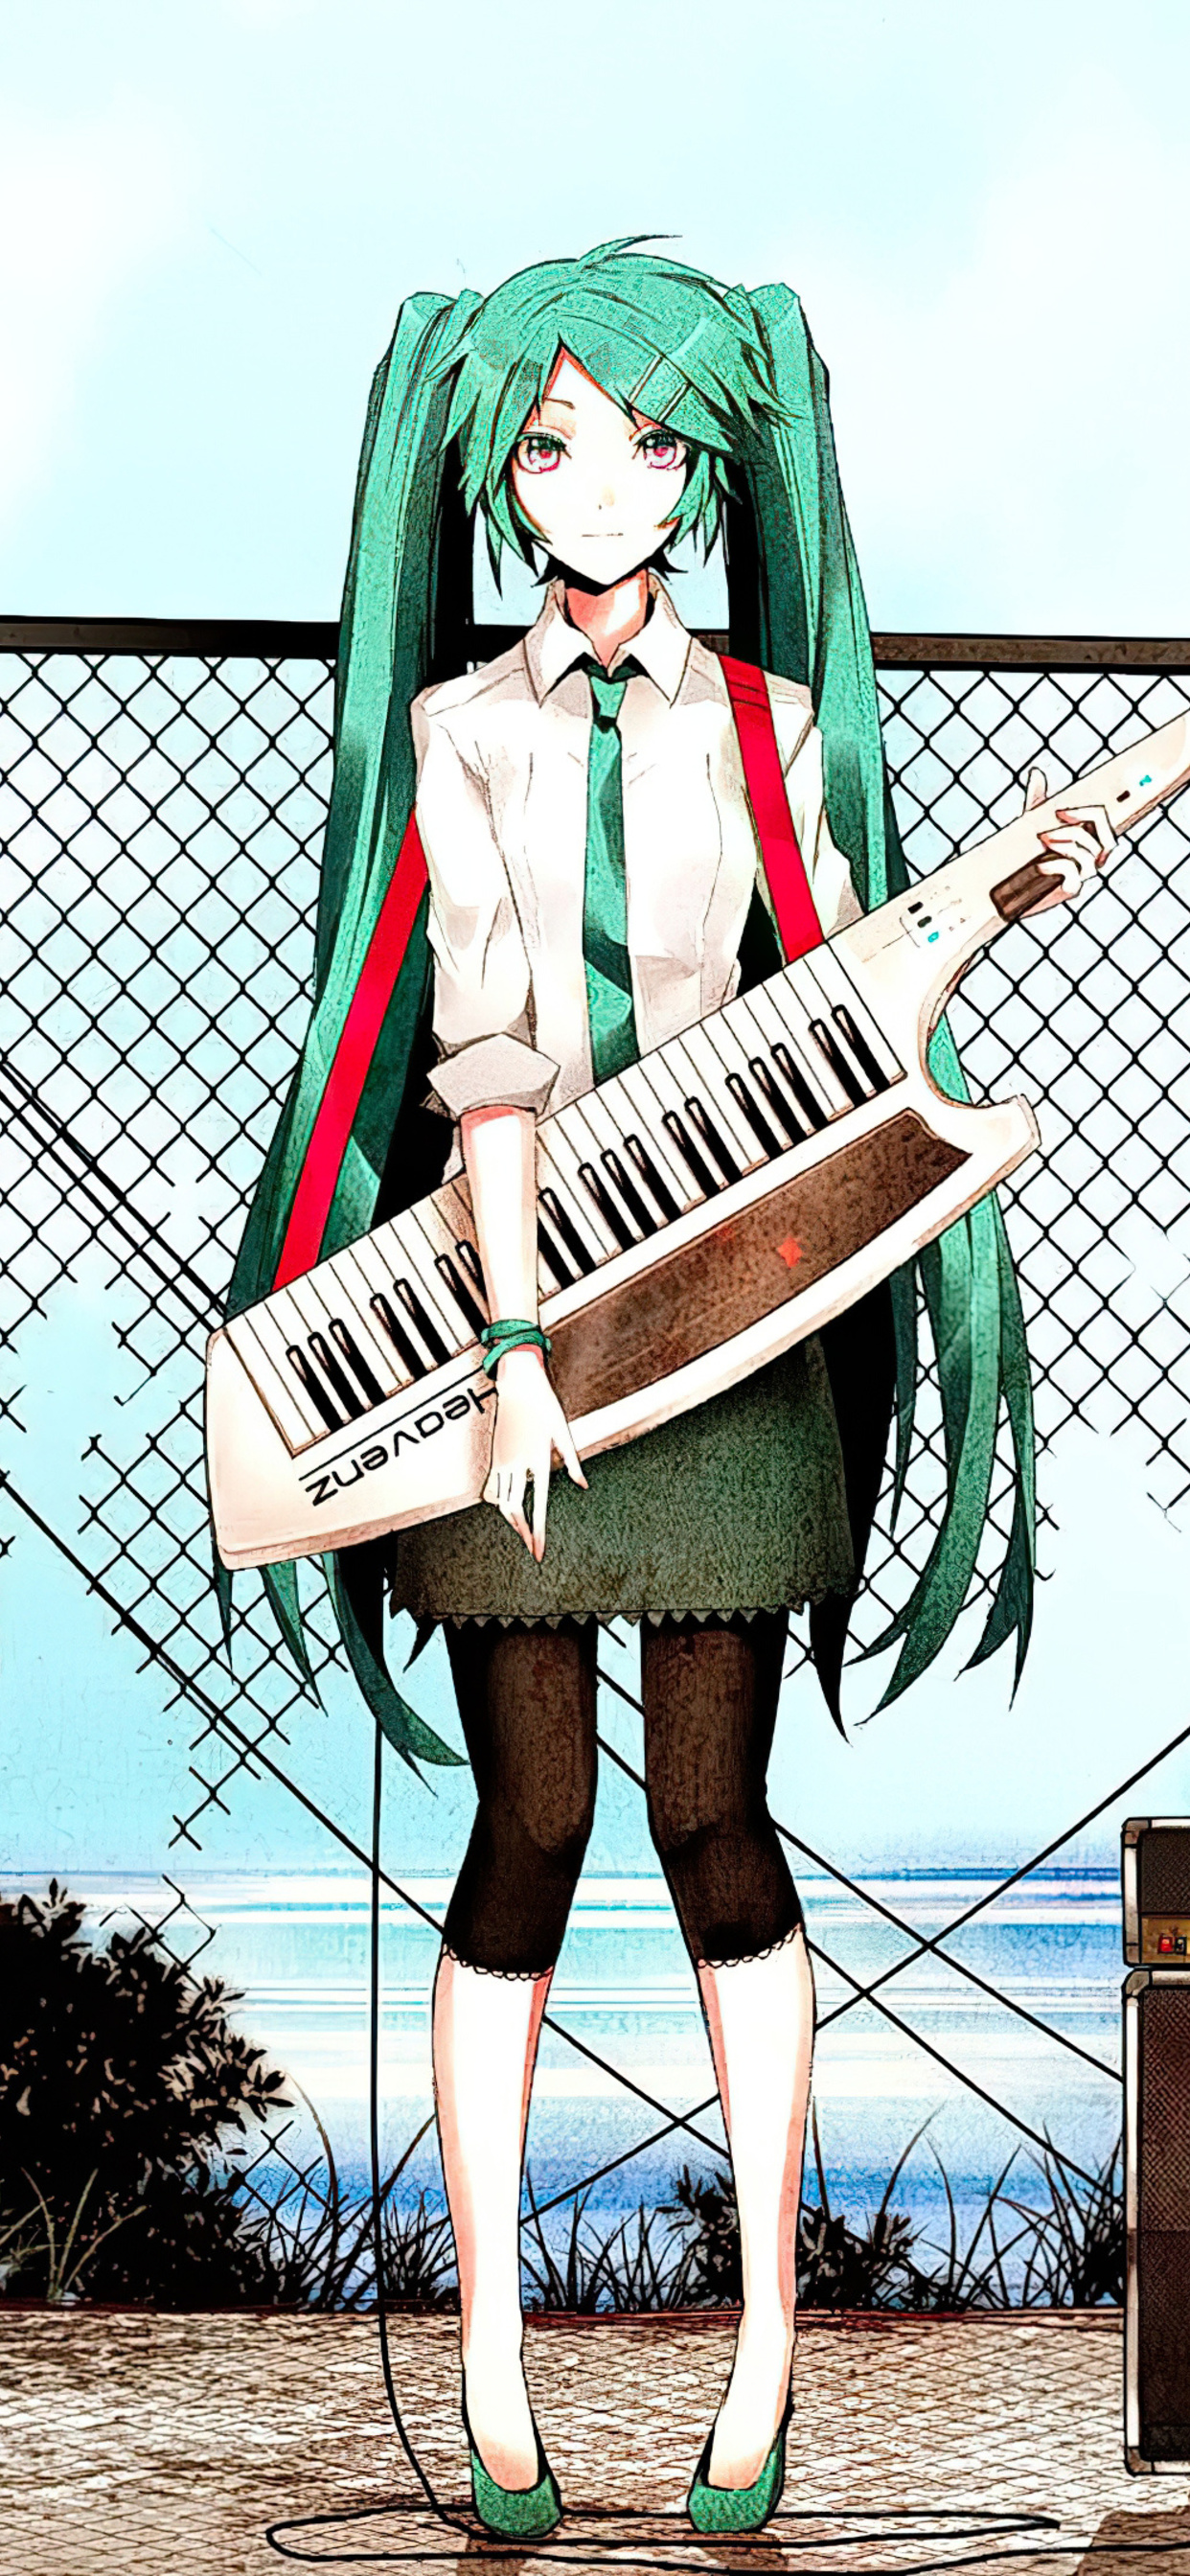 hatsune-miku-cyan-hair-standing-with-guitar-4k-oa.jpg